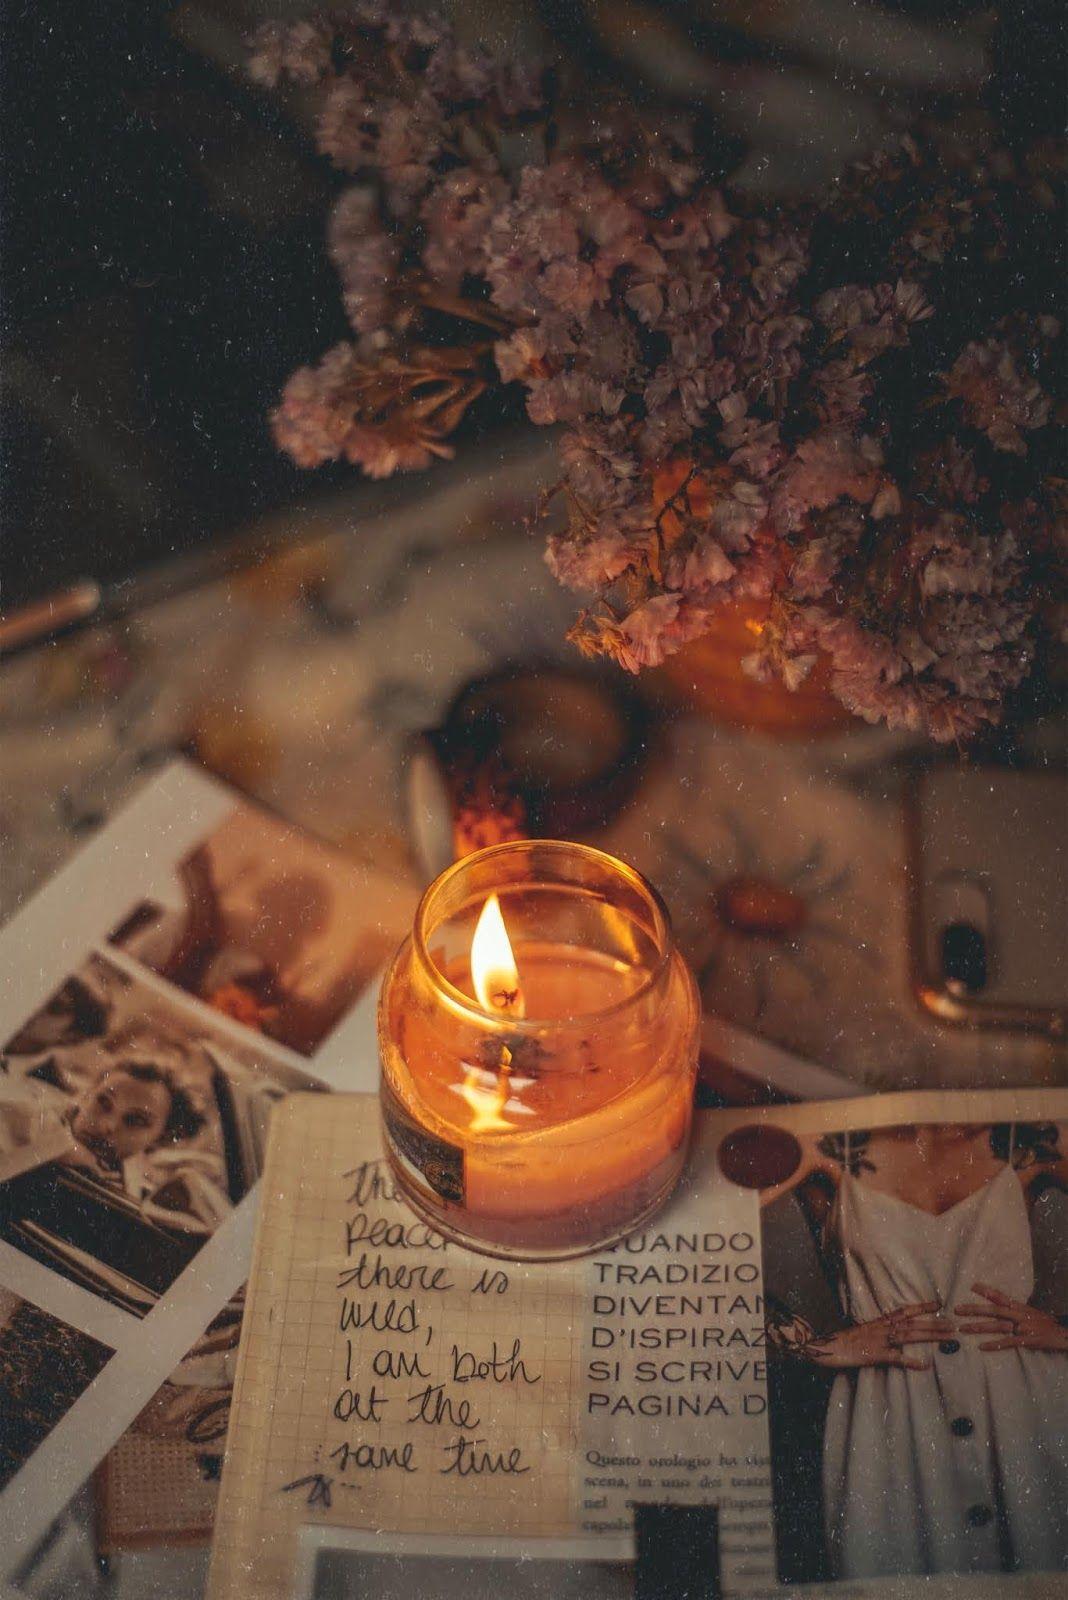 Art Bullet Journal Www Fefaluna Blogspot Com Candle Aesthetic Candles Photography Christmas Aesthetic